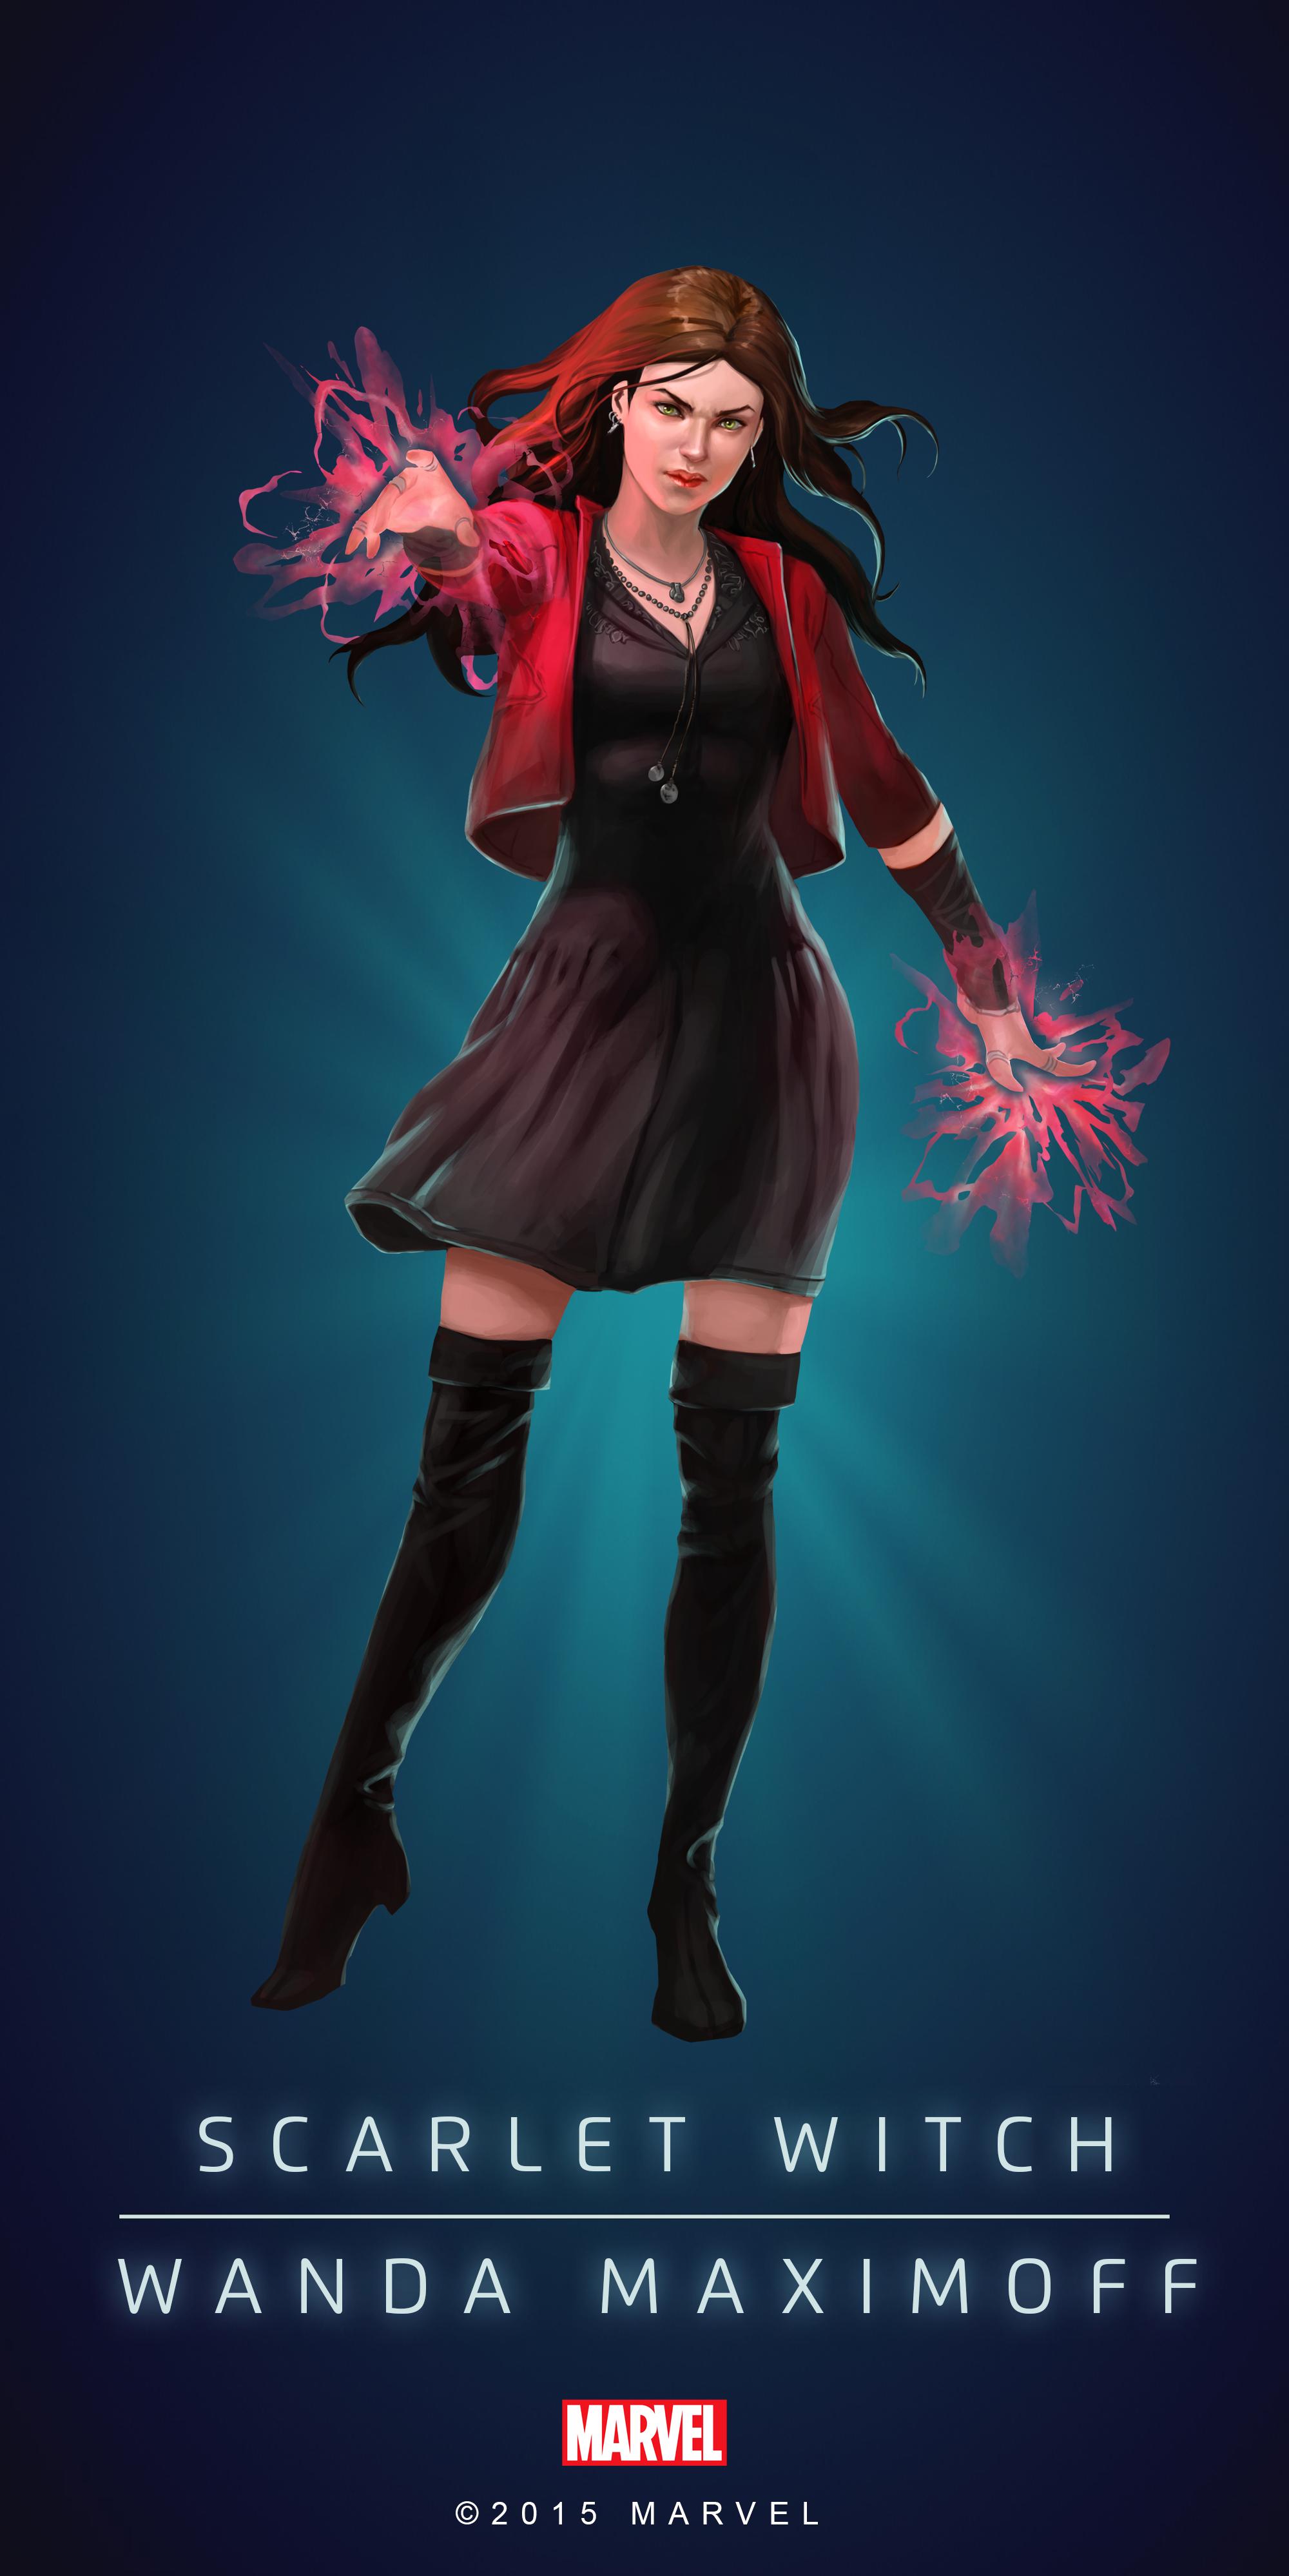 Scarlet Witch Poster 01 Png 2000 3997 Scarlet Witch Marvel Superheroes Marvel Girls